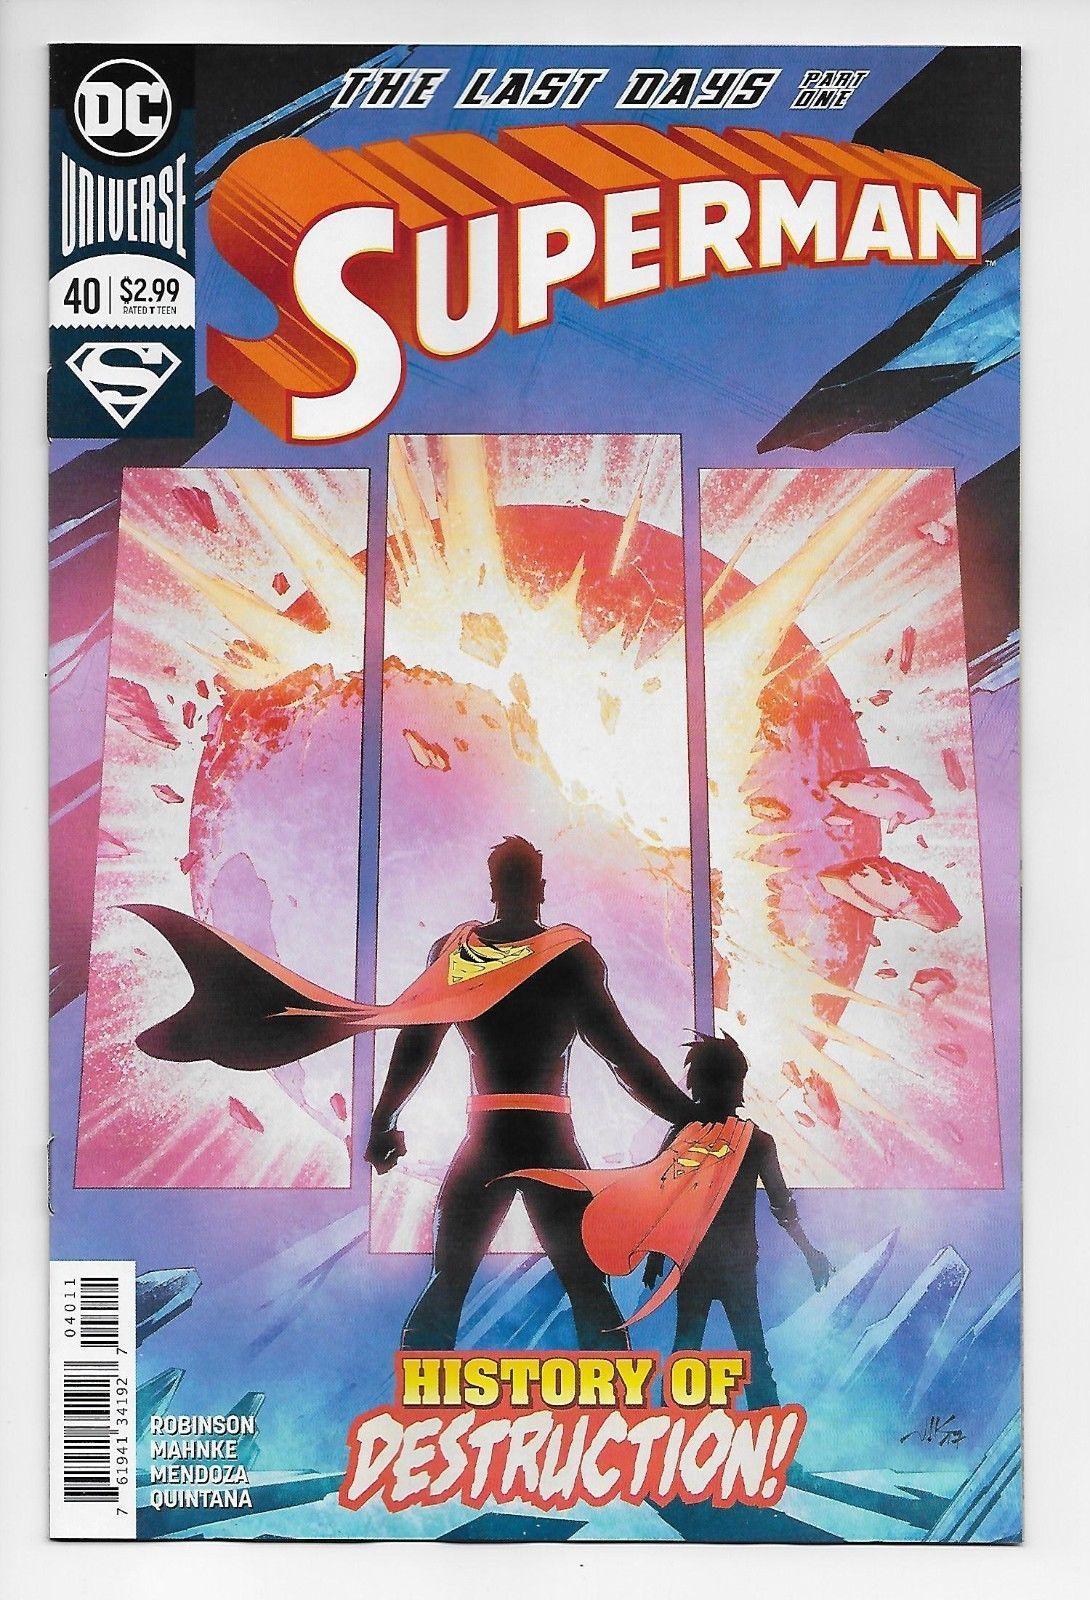 VARIANT EDITION ROCKET RACCOON #1 BLANK SKETCH DC COMICS NM